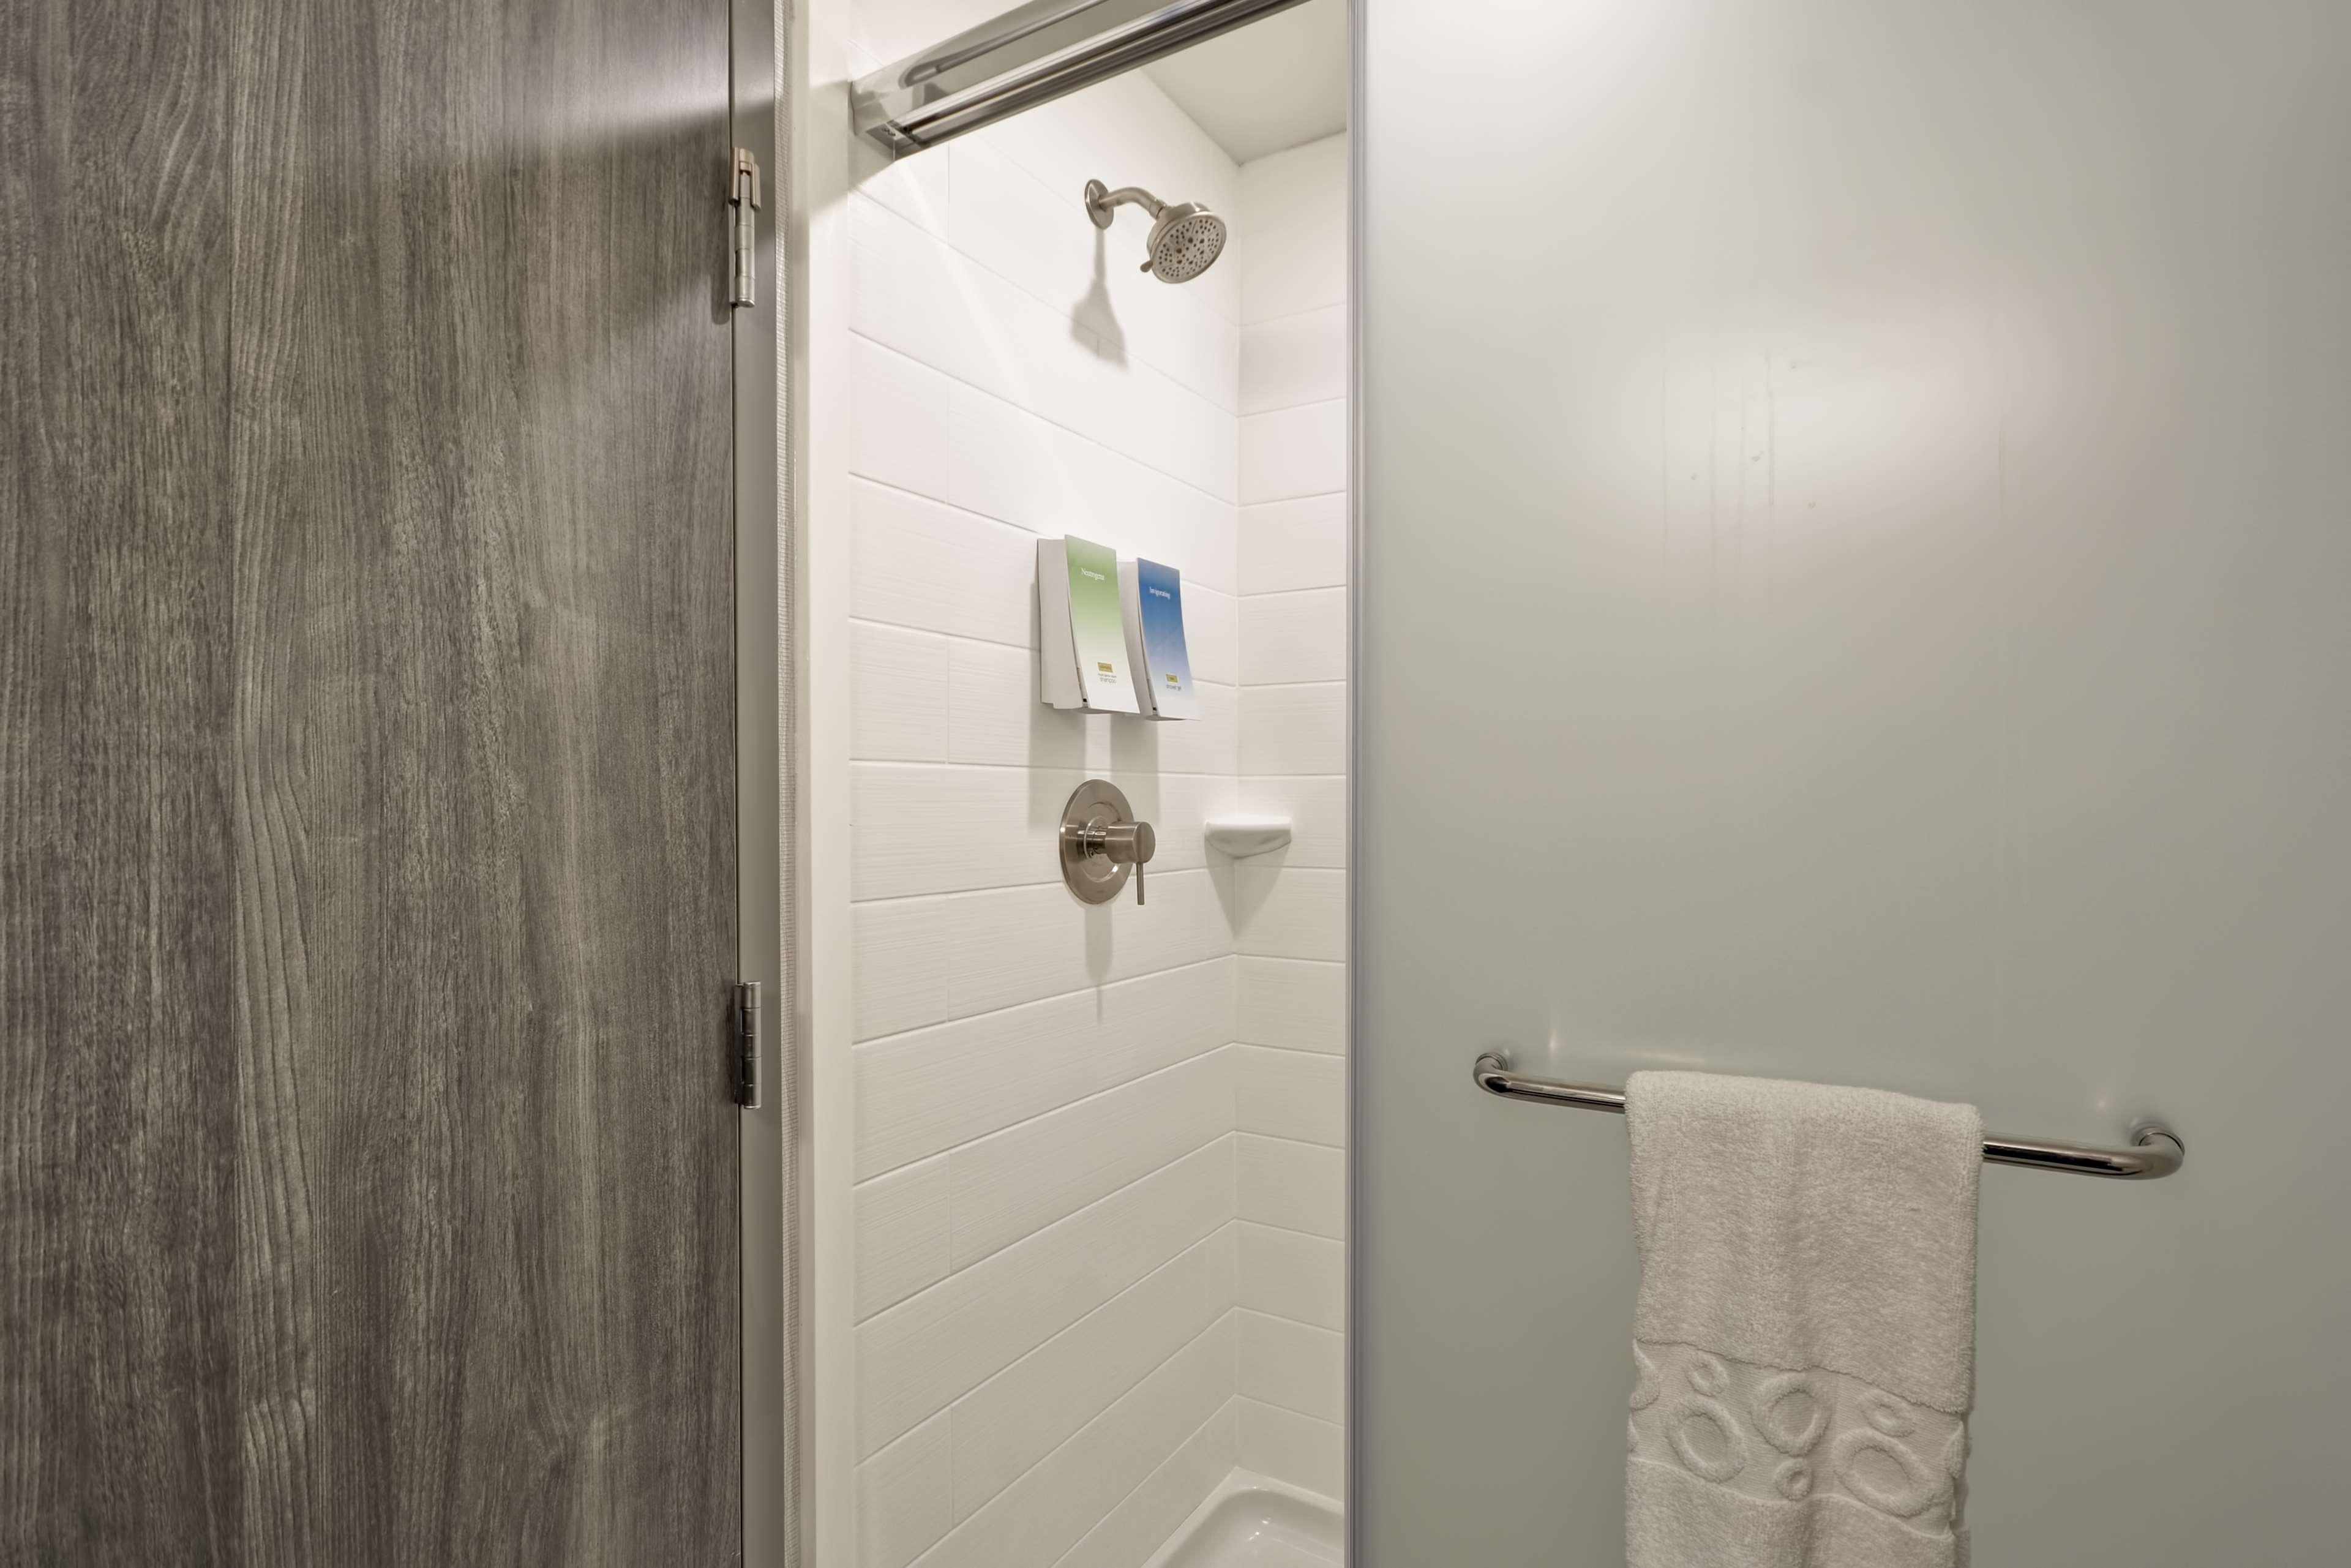 Home2 Suites by Hilton Atlanta West Lithia Springs image 23